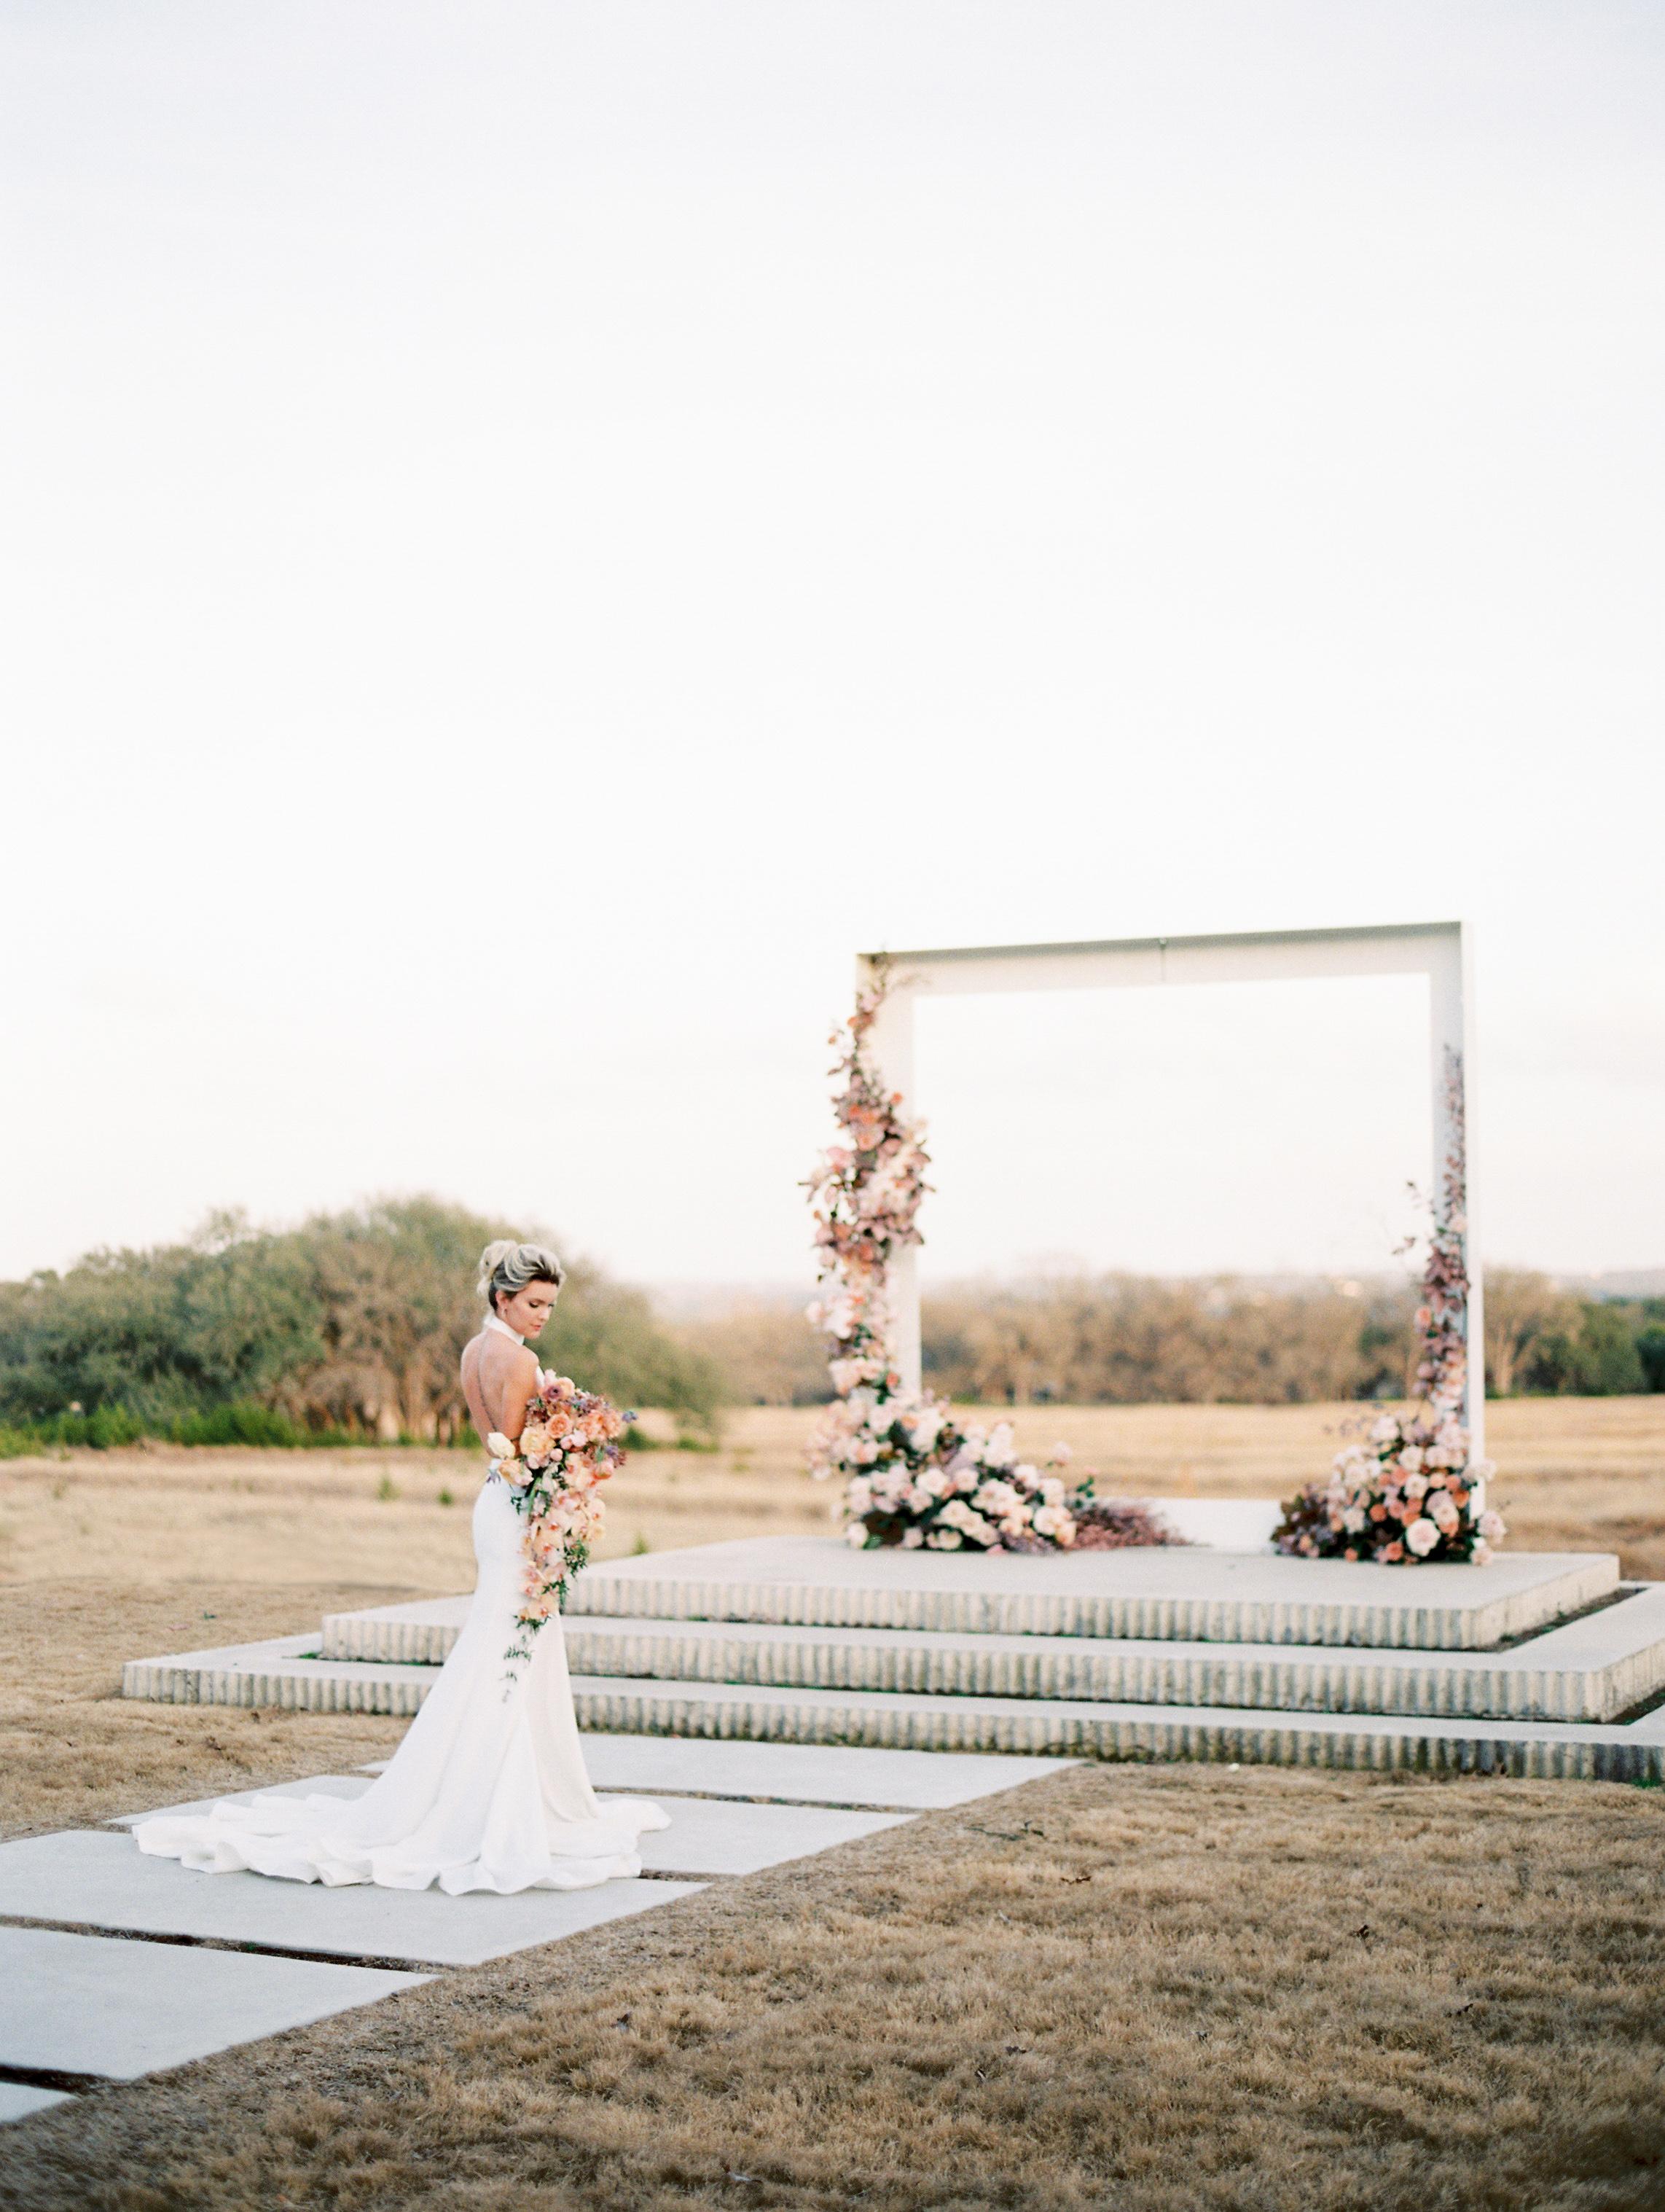 Austin-Wedding-Photography-Prospect-House-Fine-Art-Film-Destination-Dana-Josh-Fernandez-Photography-Dallas-Houston-Luxury-Best-Top-13.jpg